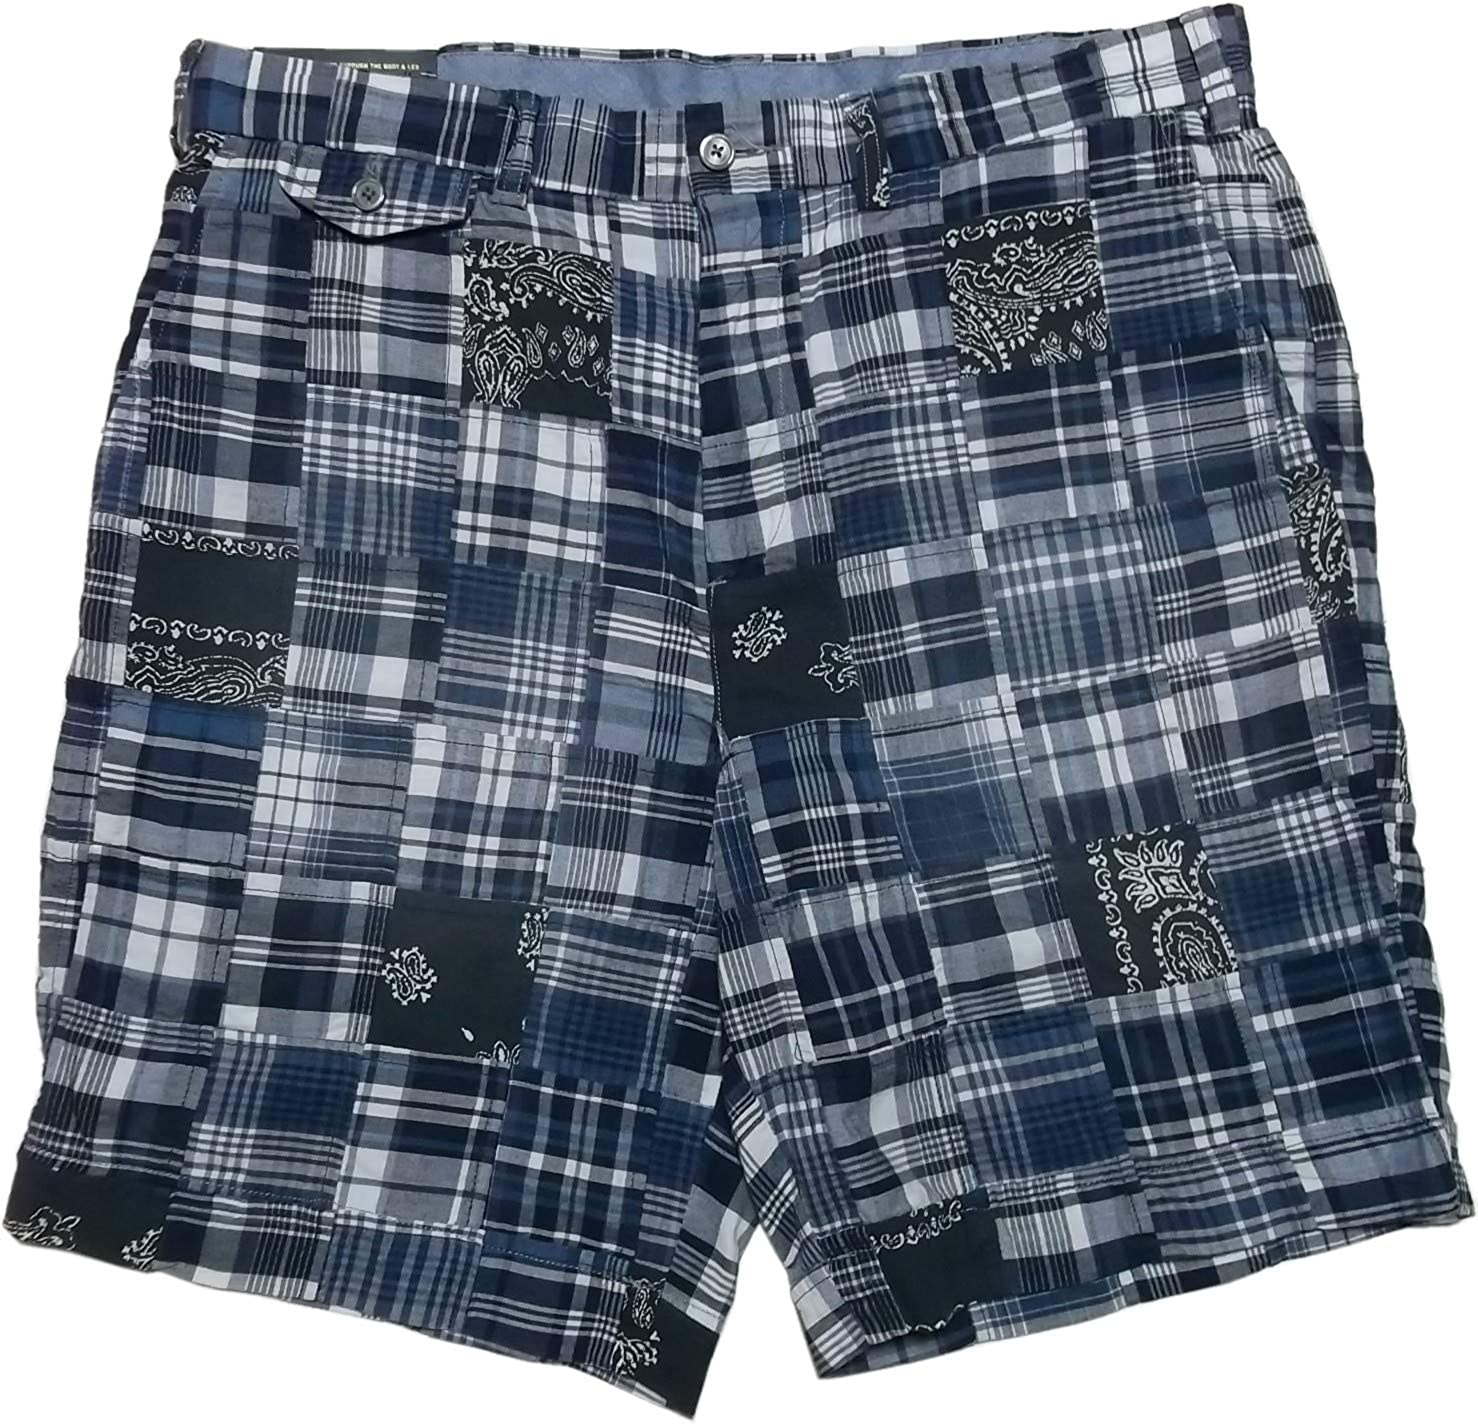 759c93f35f43cb RALPH LAUREN Polo Men's 9 Patchwork Madras Plaid Shorts Size 34 Indigo Multi  ab2246